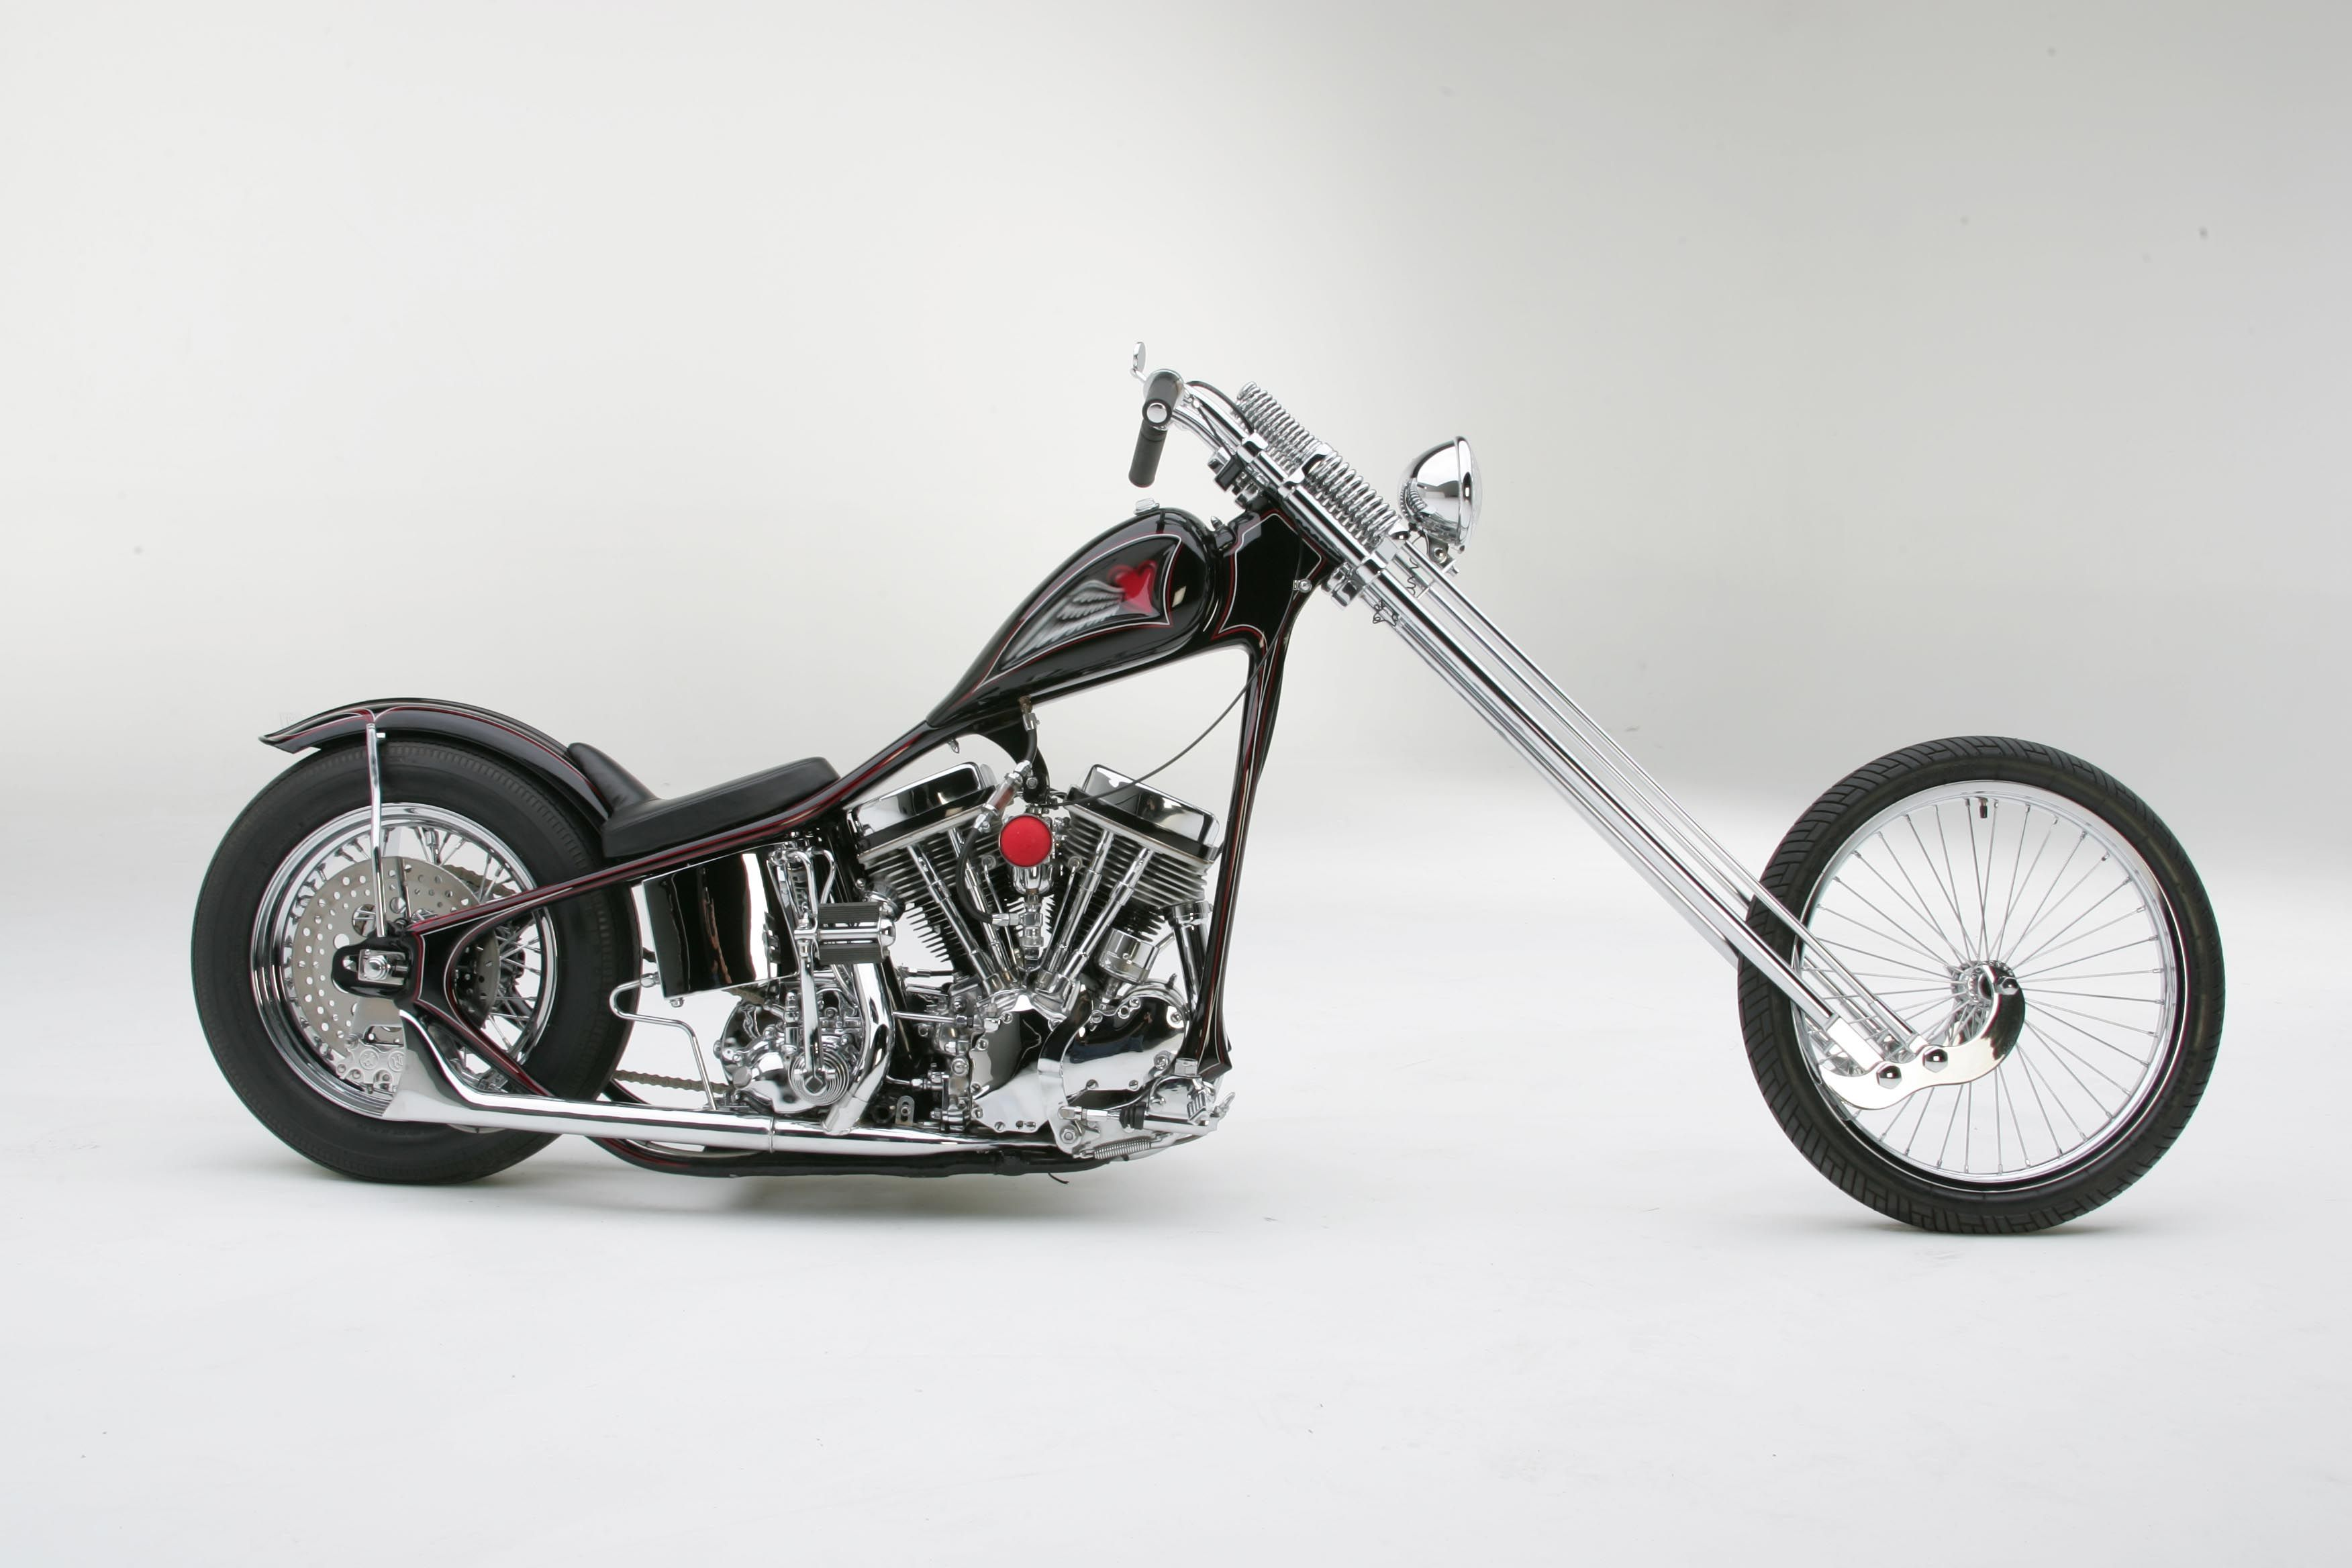 Harley davidson chopper motorcycle harley davidson - Old school harley davidson wallpaper ...